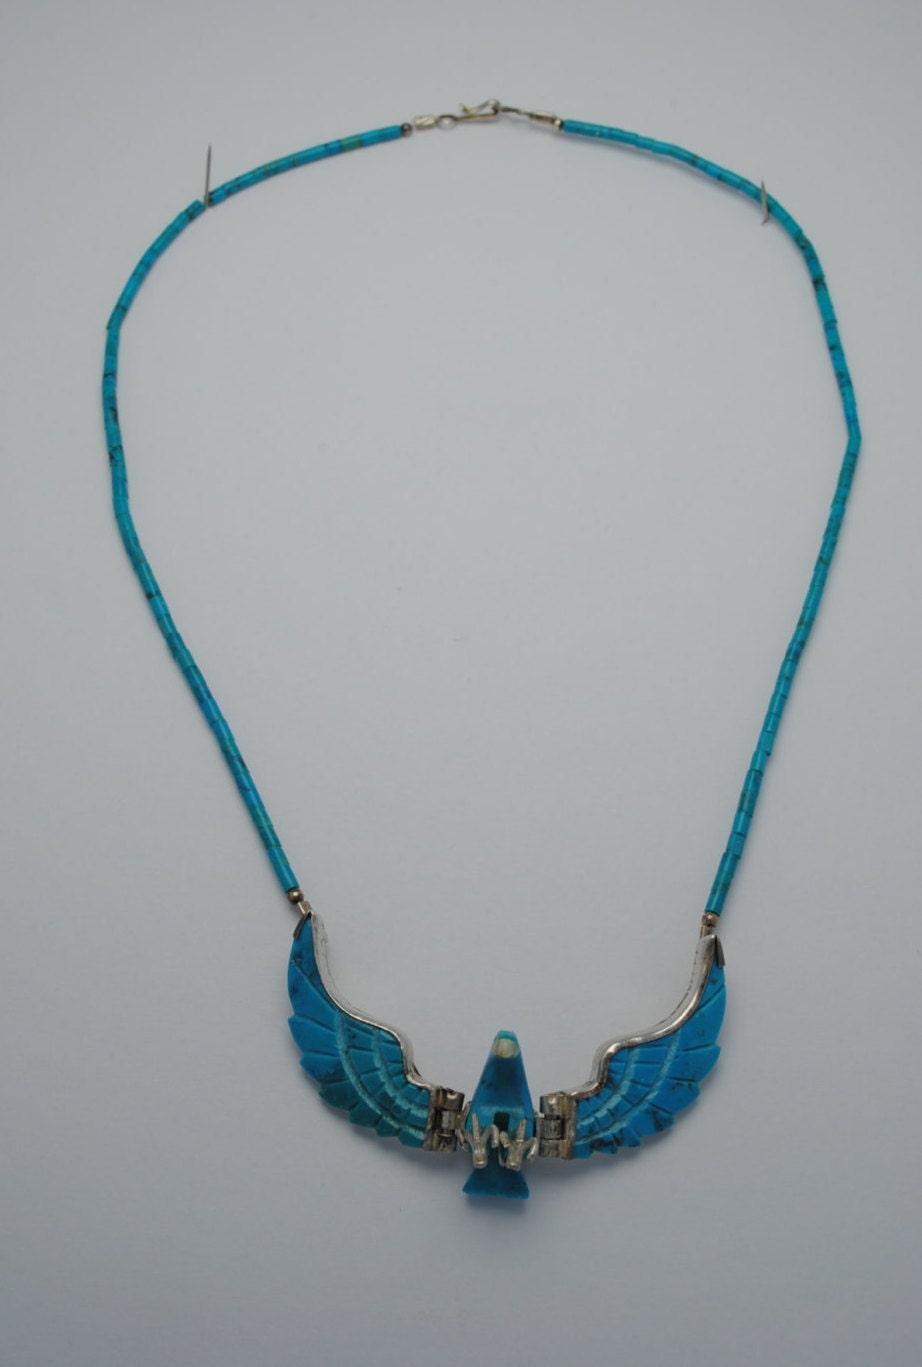 Bijoux American Vintage : Turquoise eagle necklace vintage